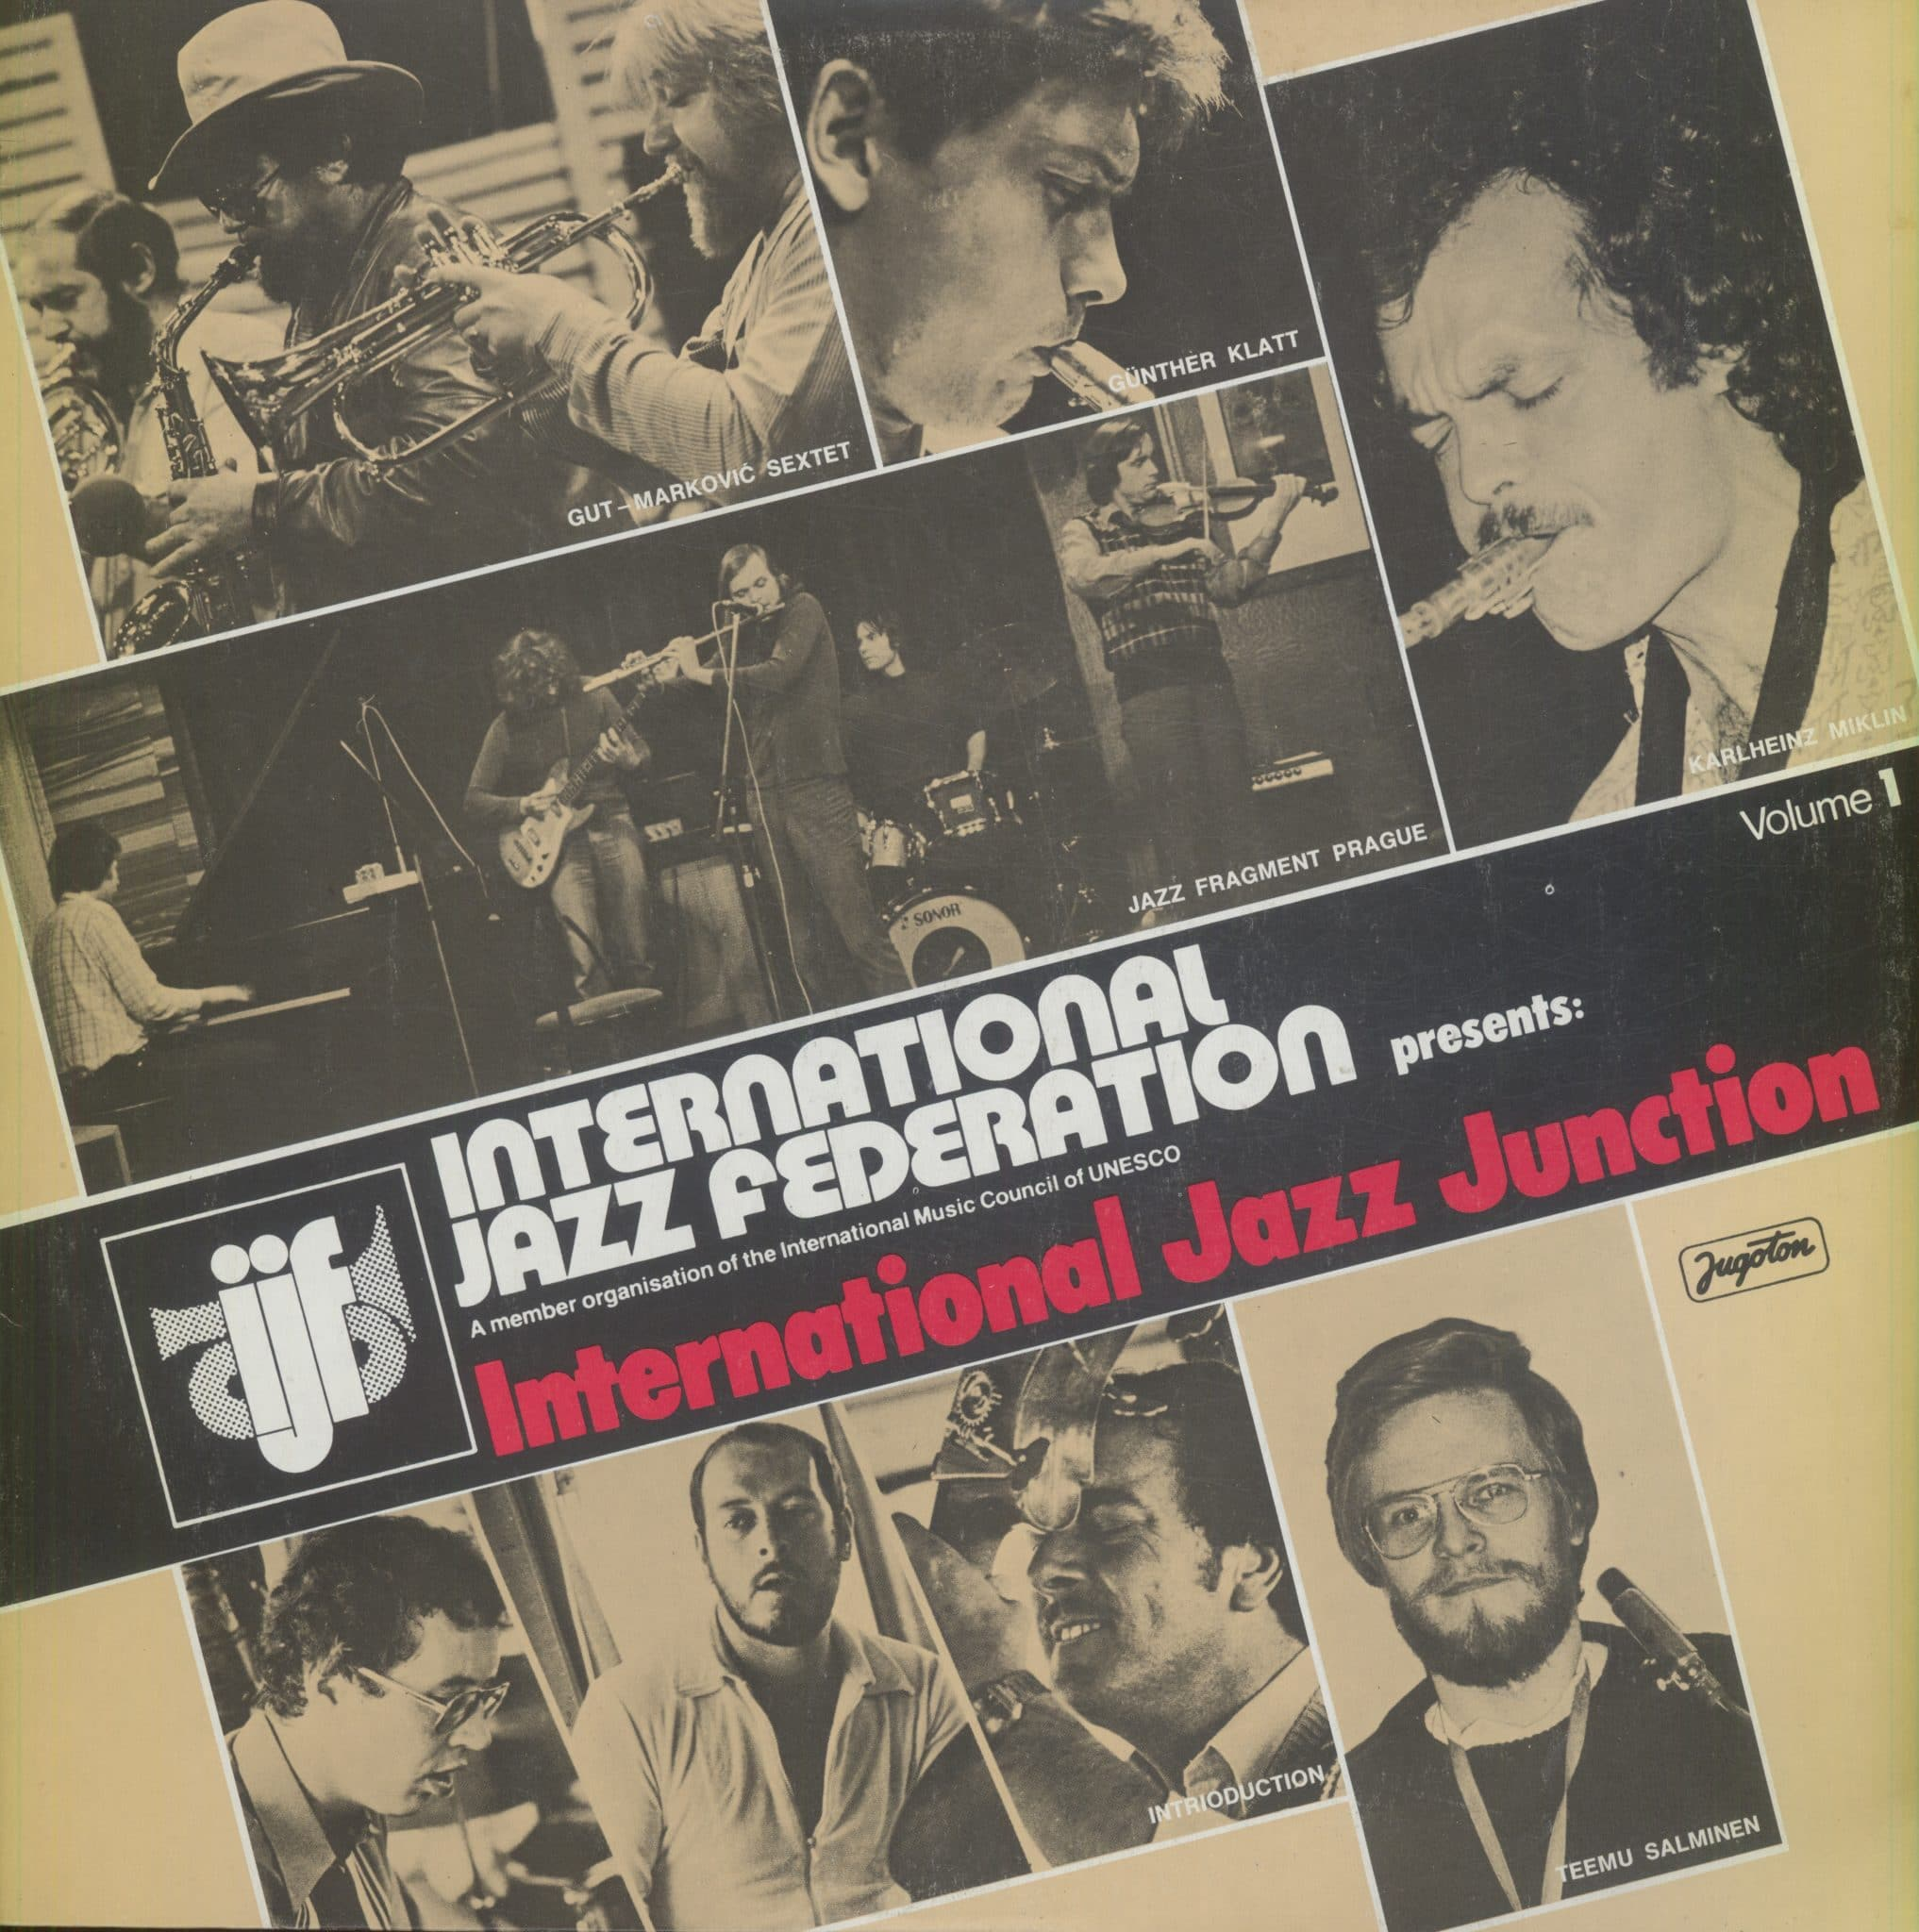 Gramofonska ploča International Jazz Federation Presents: International Jazz Junction, Volume 1 Günther Klatt Quartet / Jazz Fragment Prague / Karlheinz Miklin Trio... LSY-66193